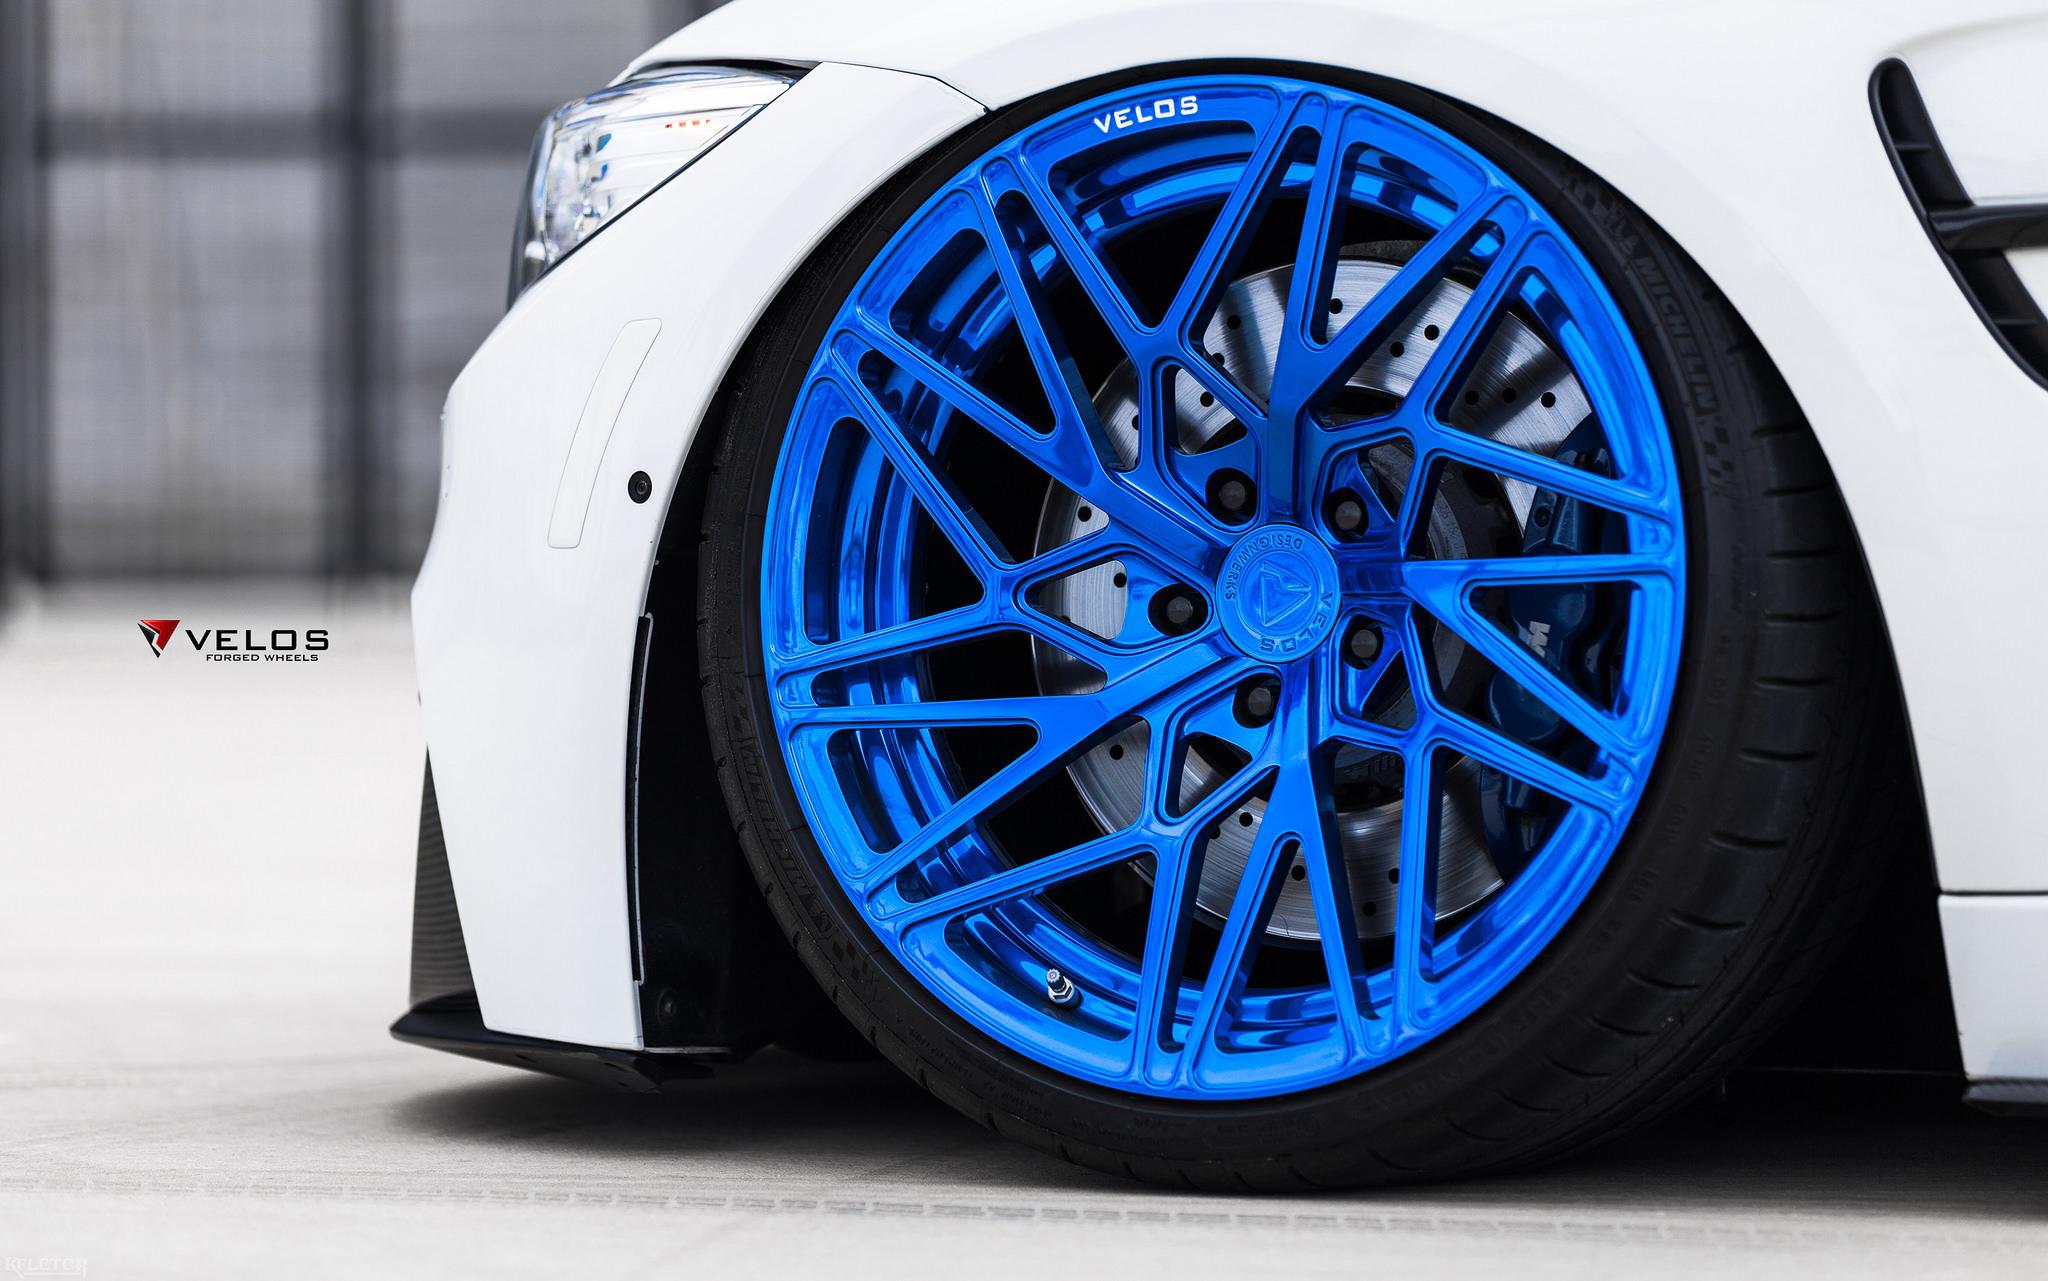 Alpine White BMW M3 With Candy Blue Velos Designwerks Wheels Image 19